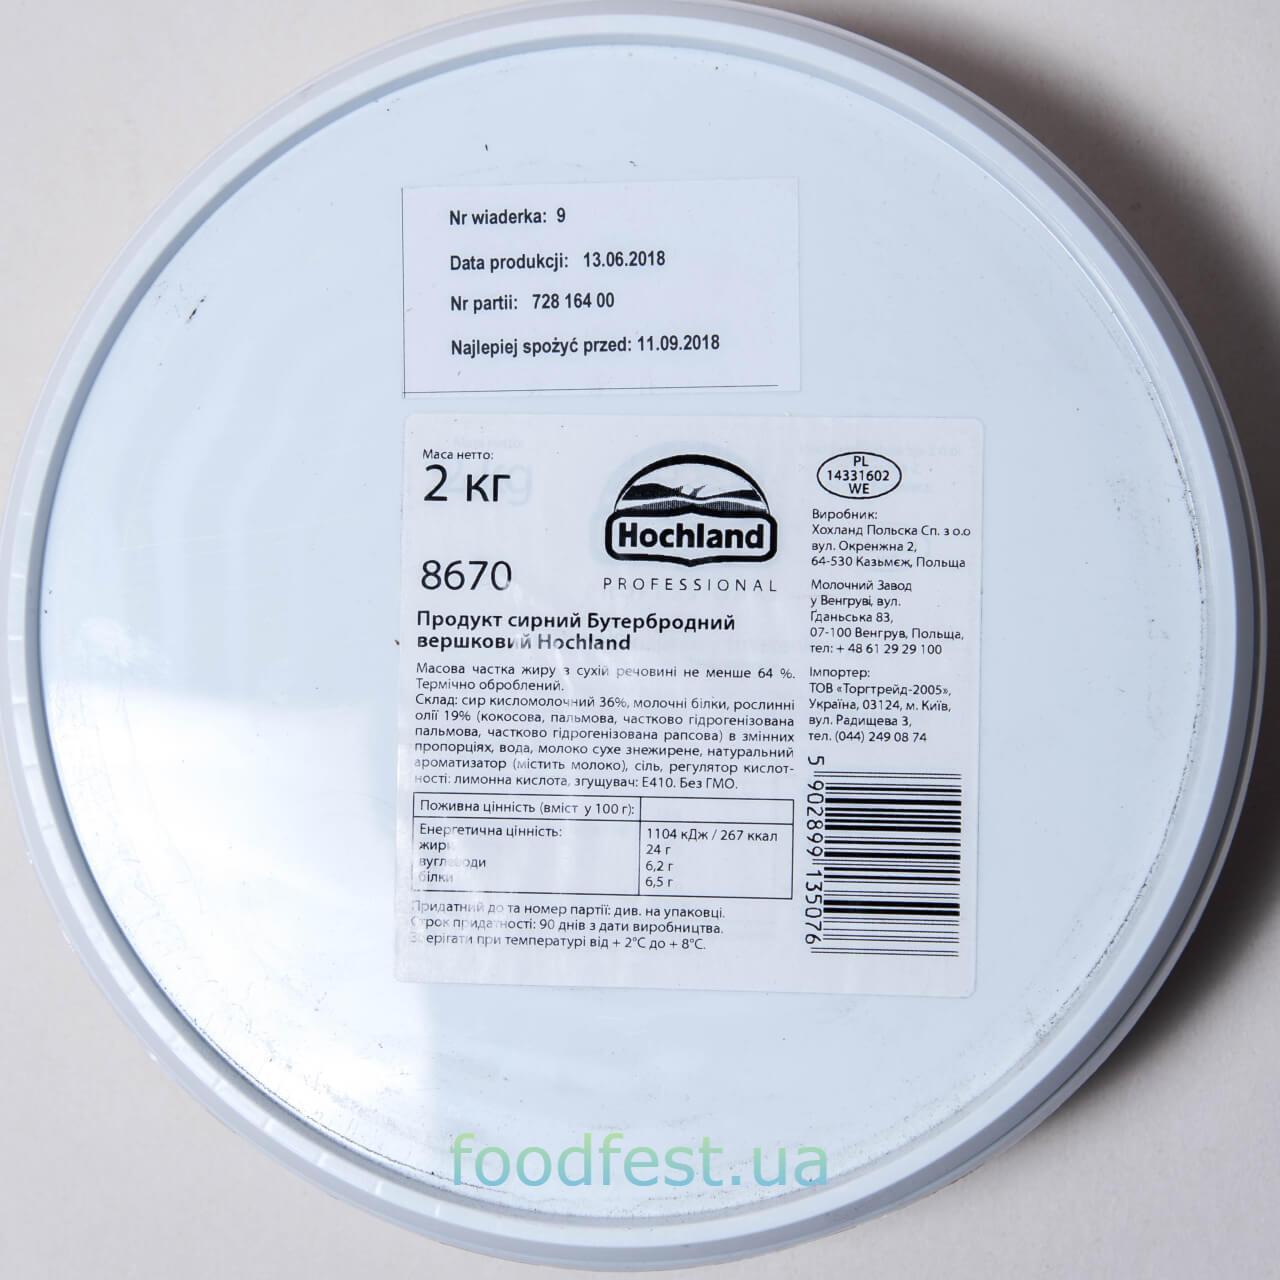 Крем-сир Канапковий ТМ Hochland Professional 2 кг